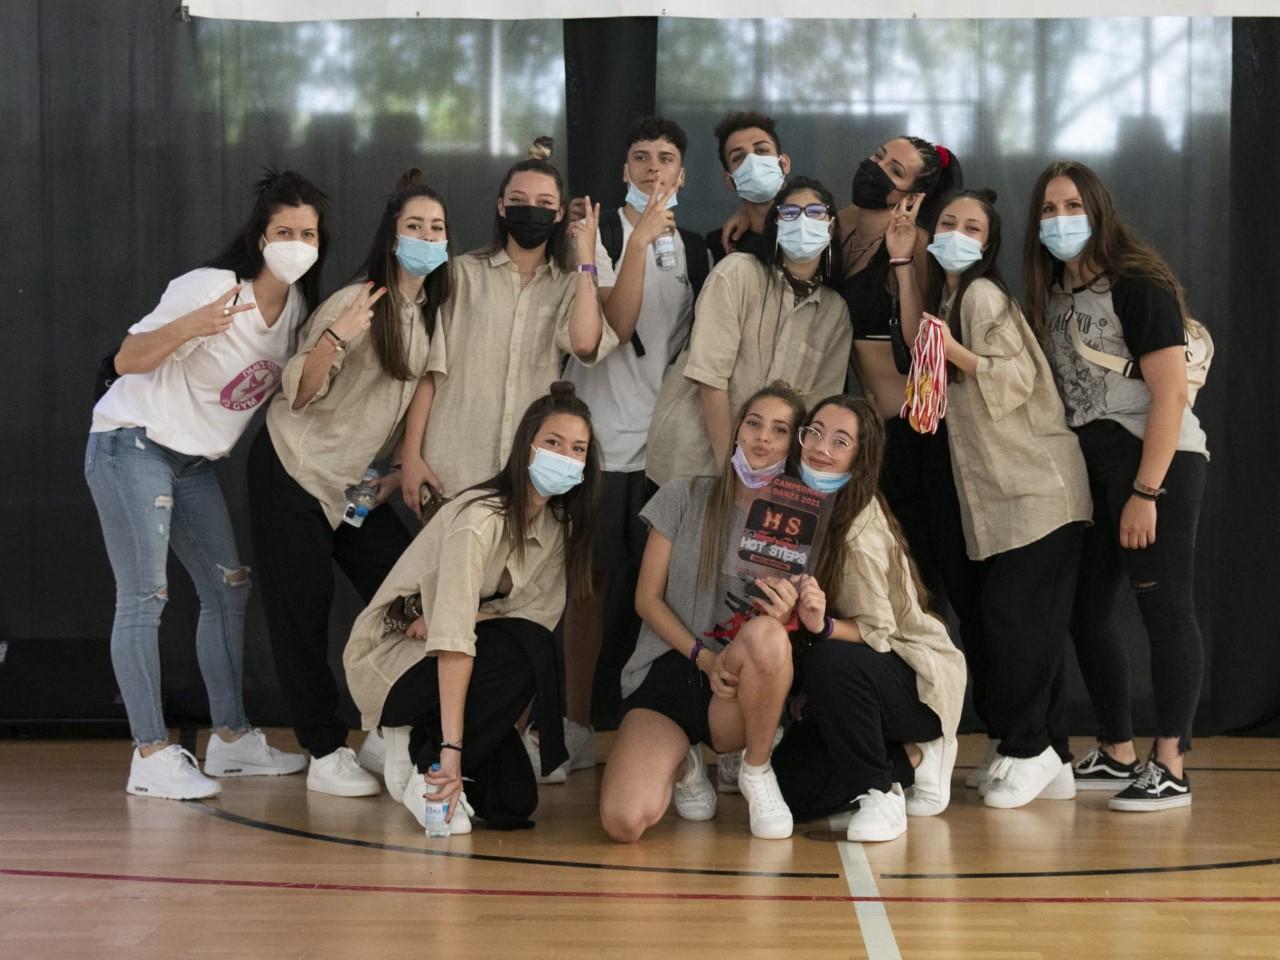 Primera posicio per al grup Homies | DANCE STREET& FES GYM